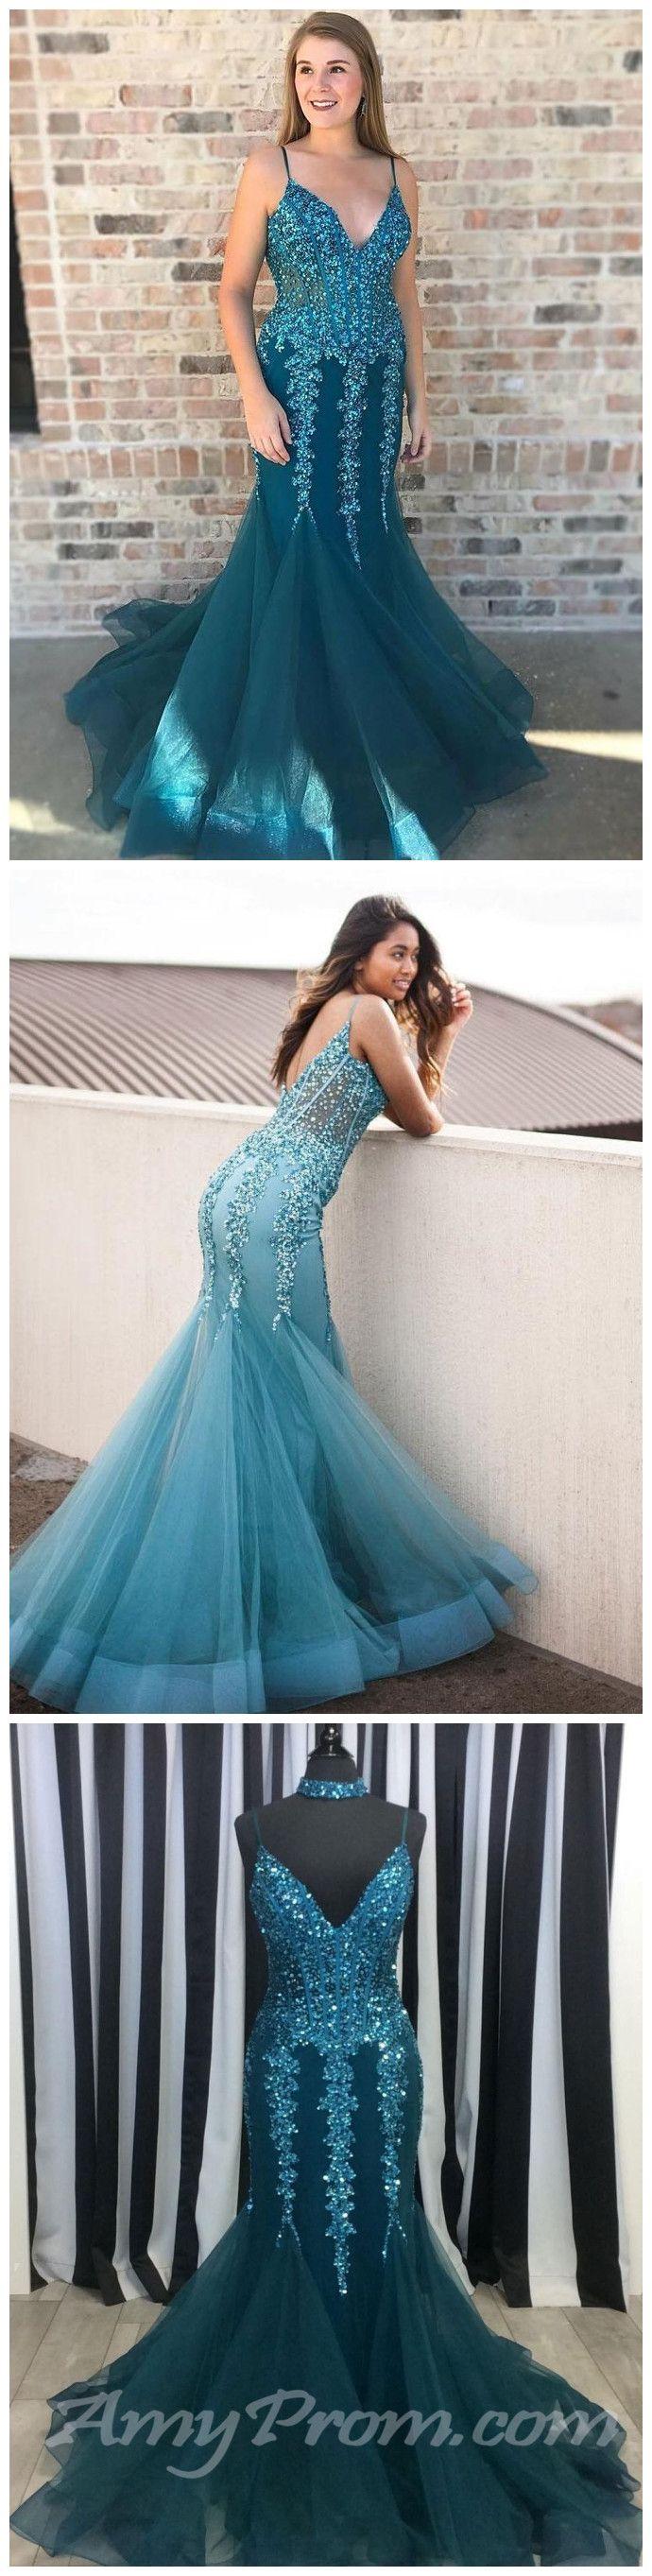 chic trumpetmermaid prom dresses beading long prom dress